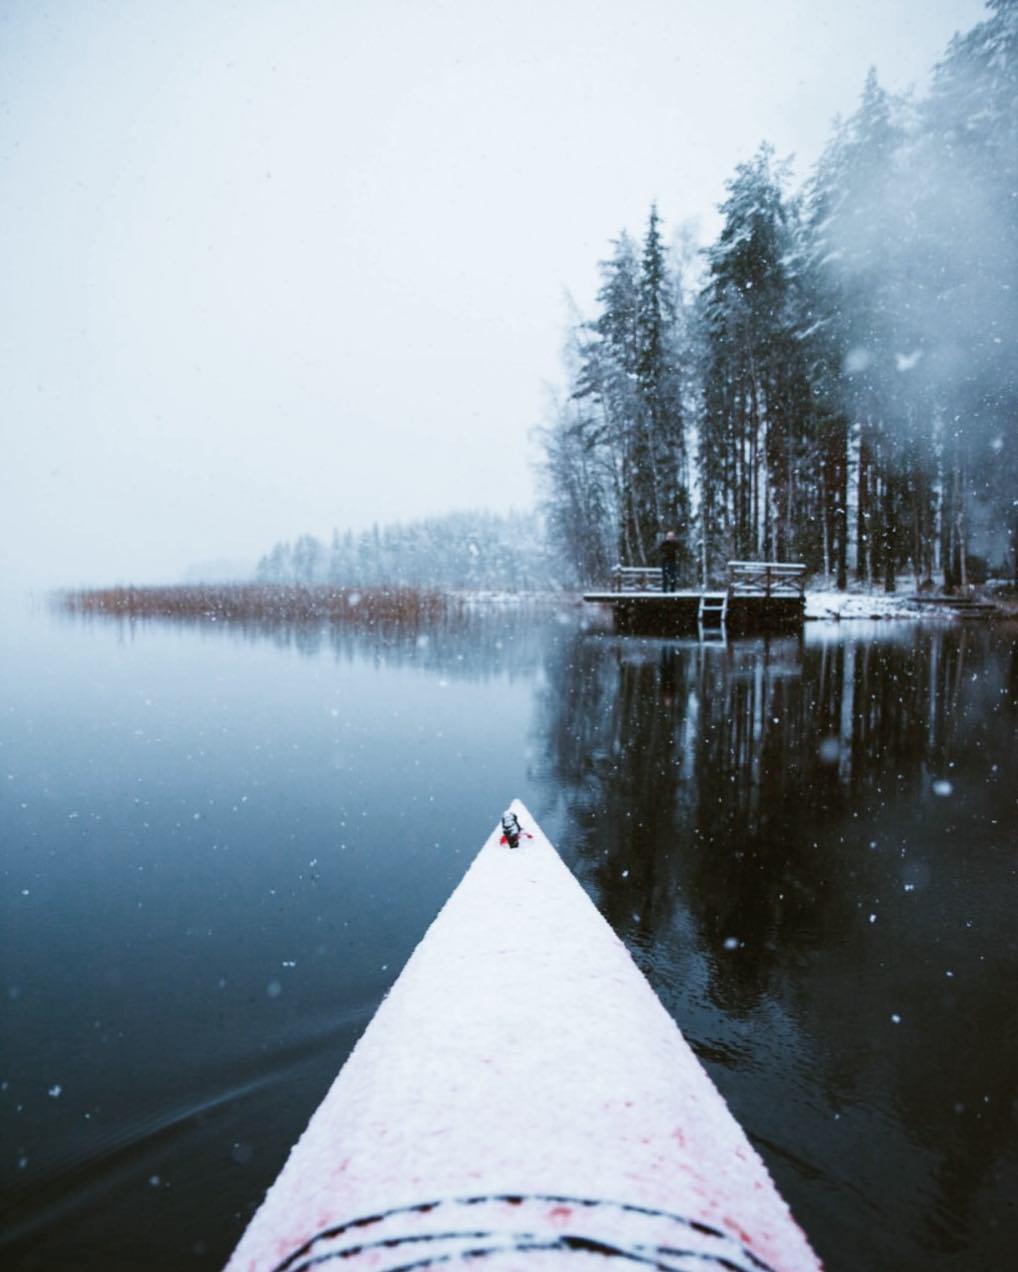 Природа и путешествия на снимках Йоонаса Линкола